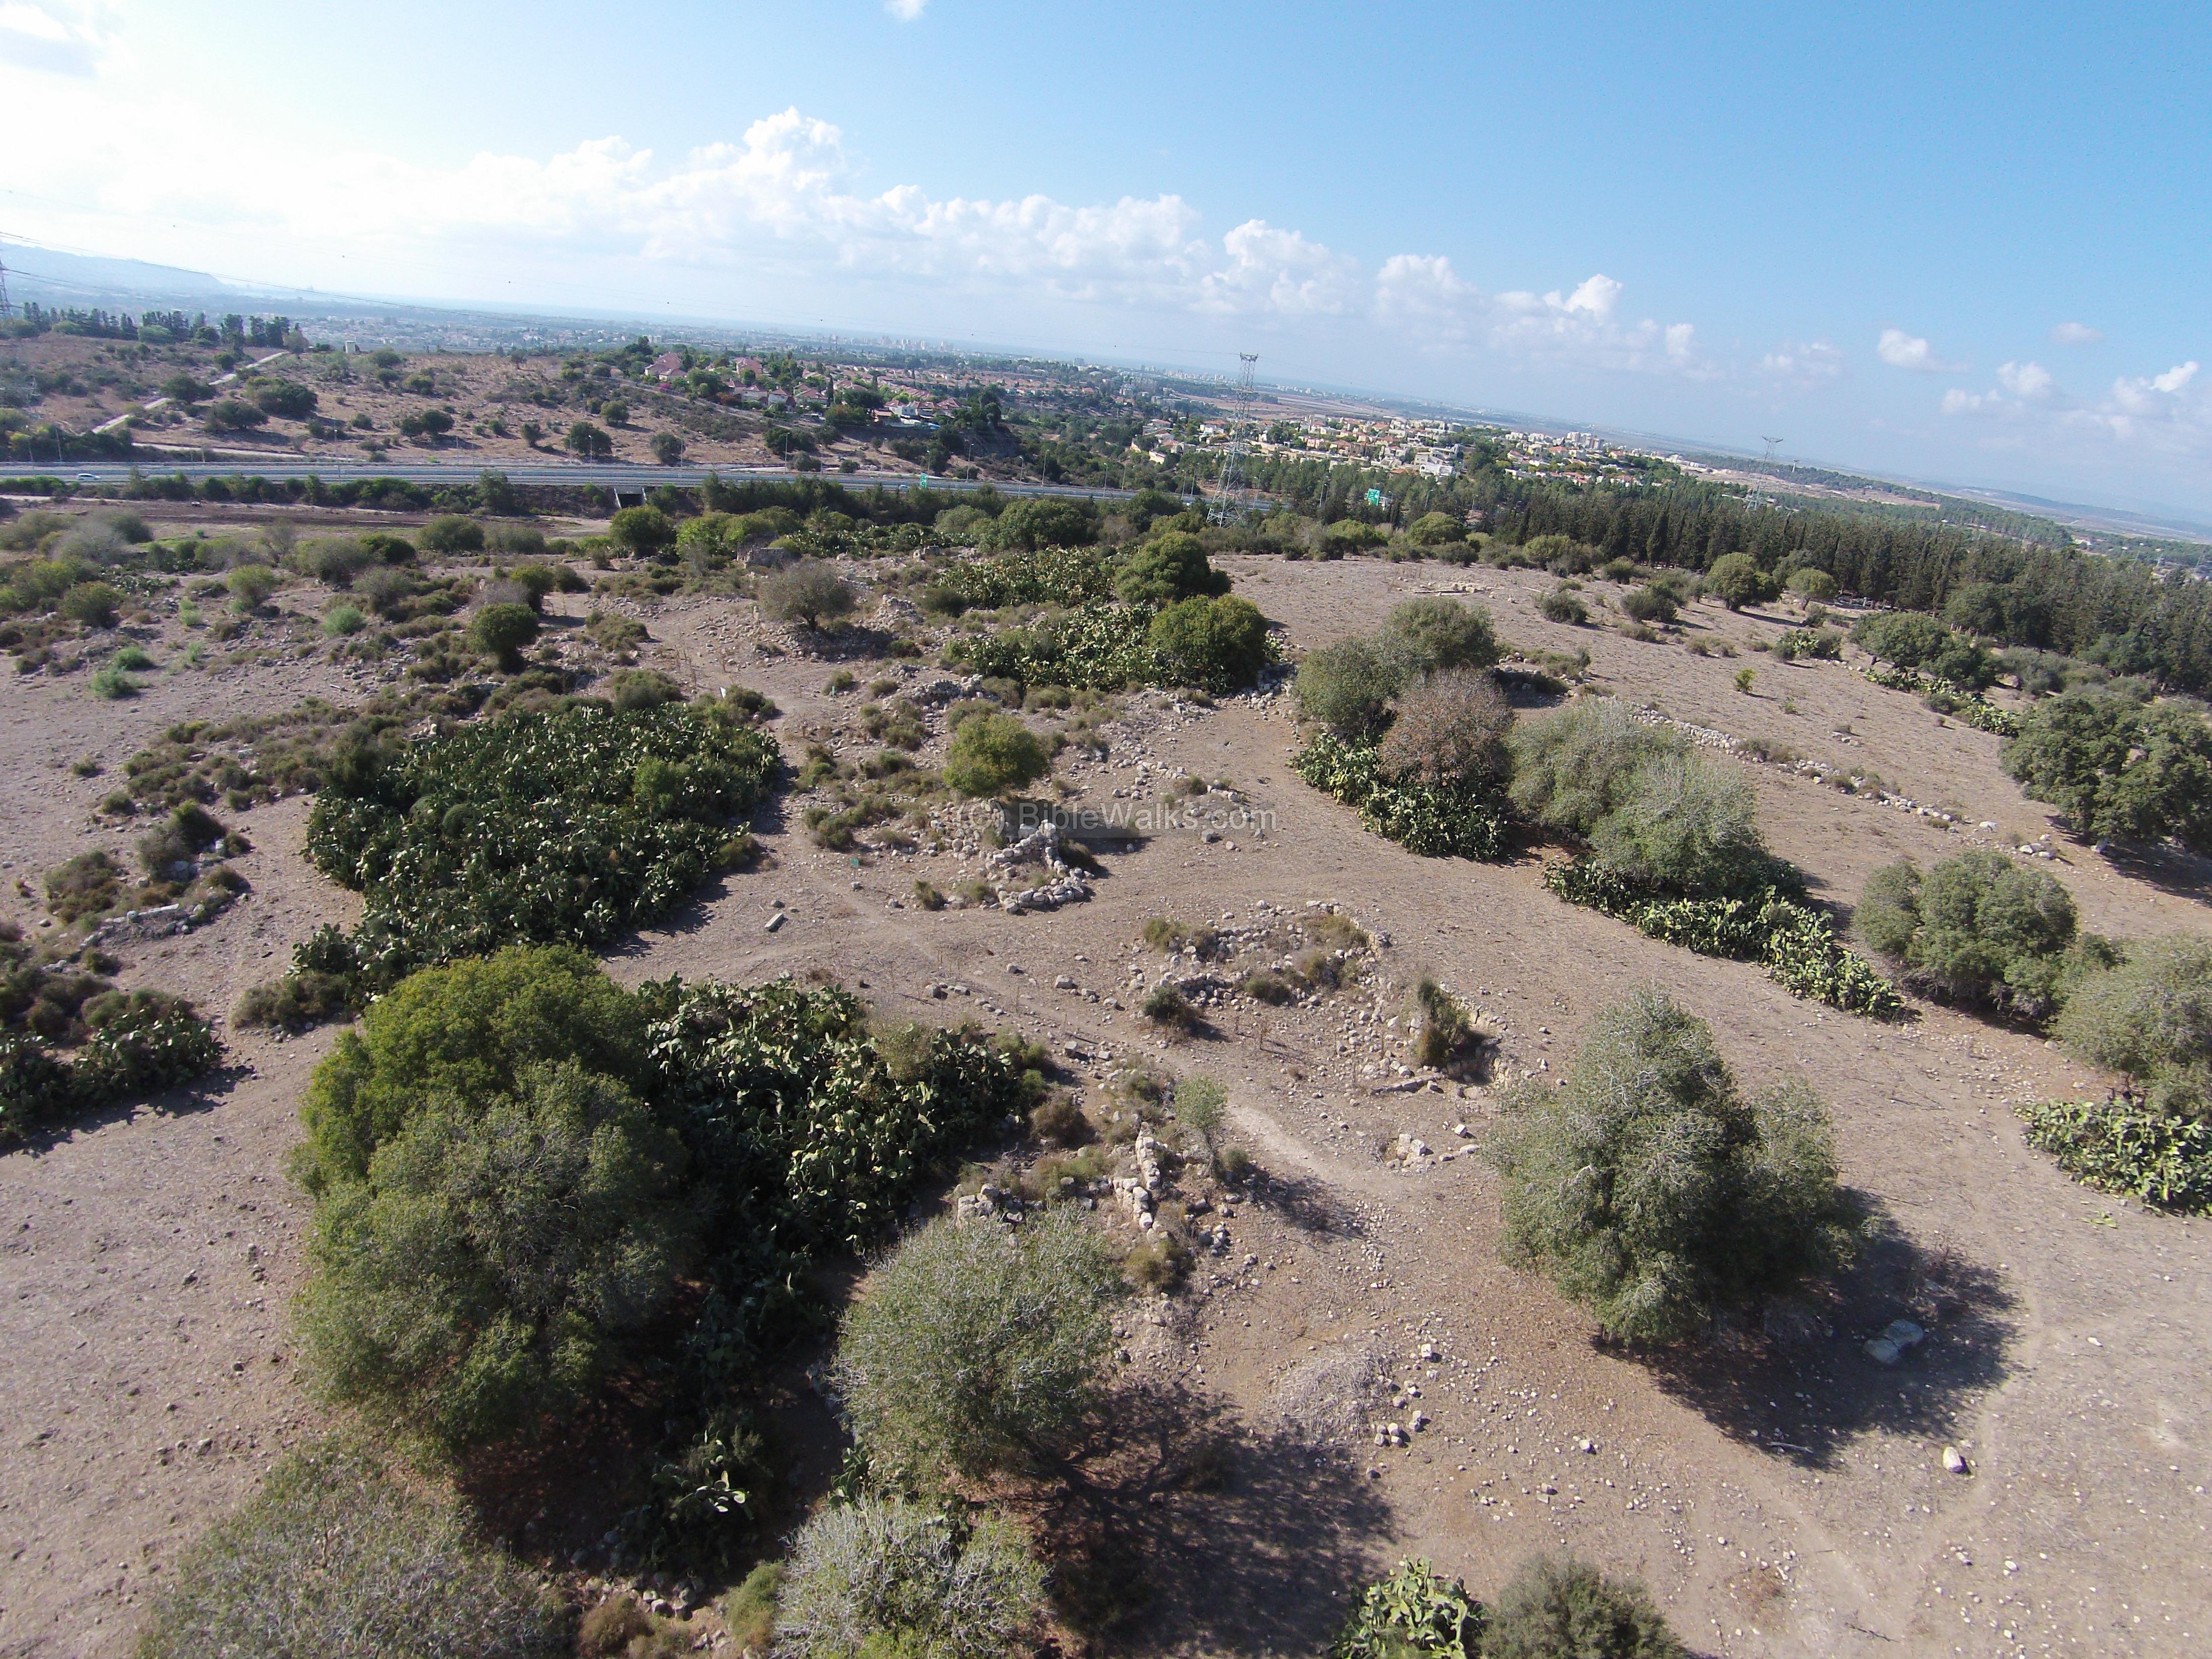 Usha - the place of the Sanhedrin